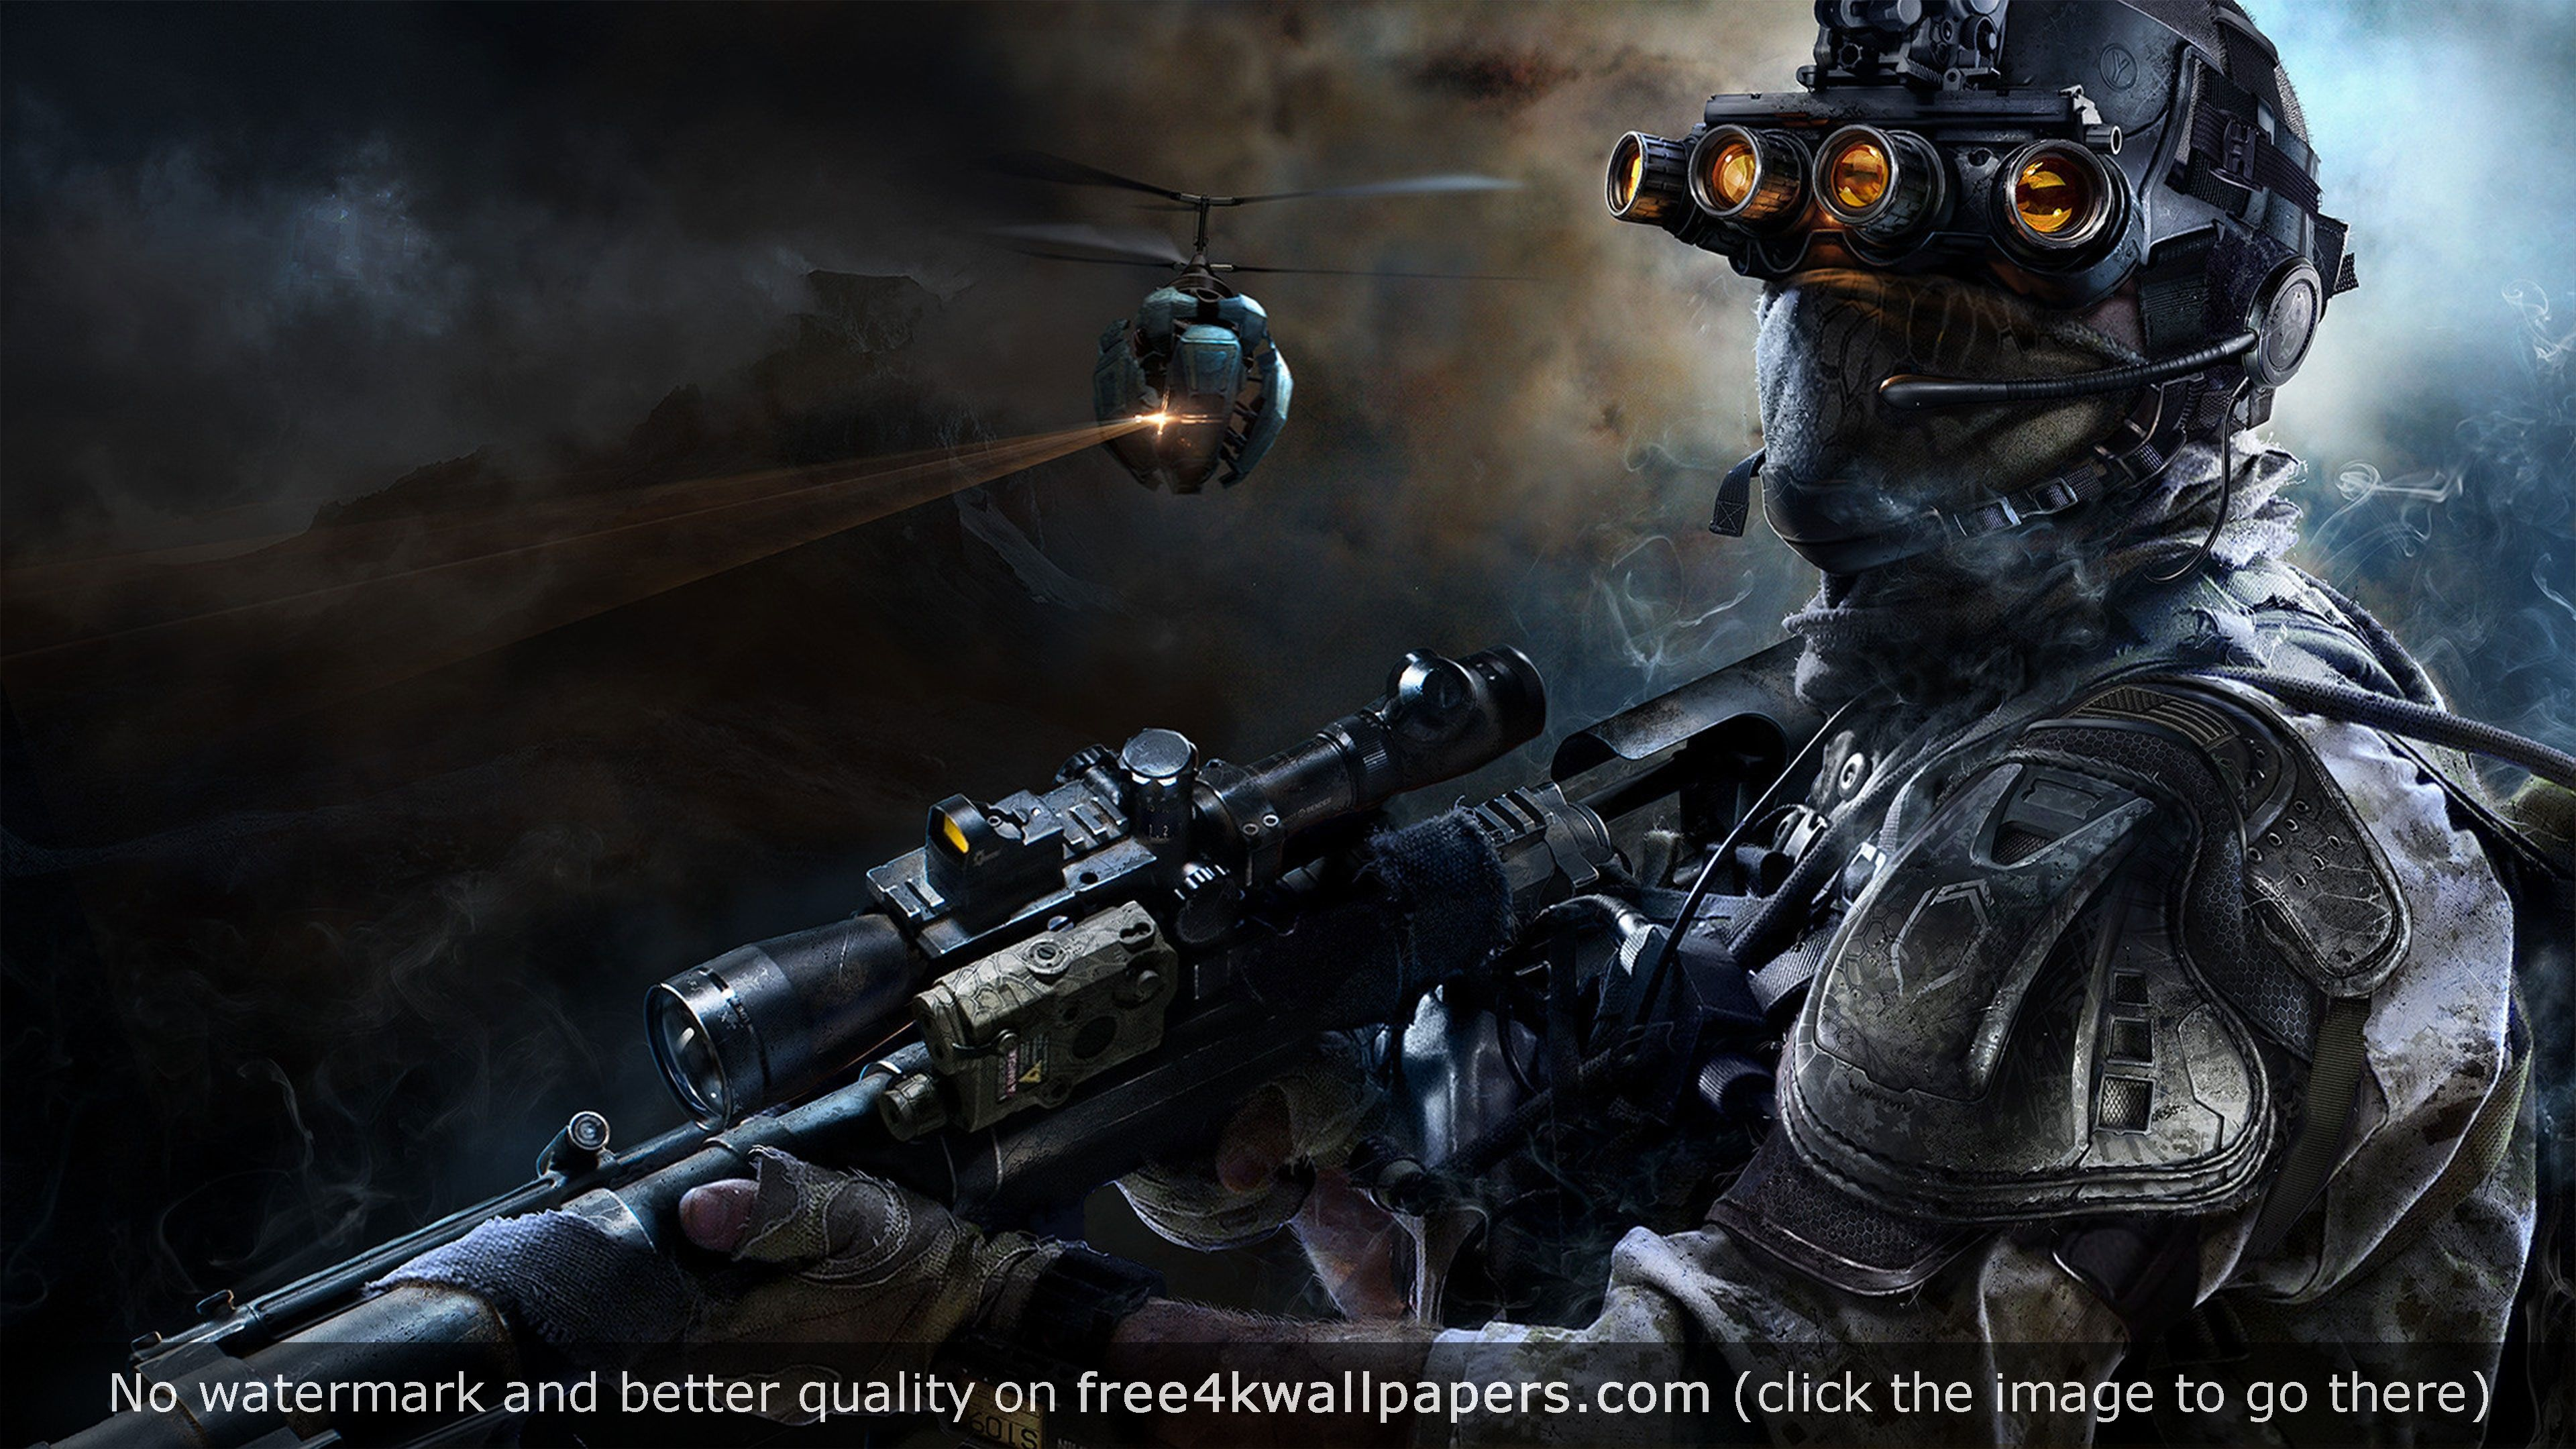 Sniper Ghost Warrior 4K wallpaper Warrior 3, Warrior 1